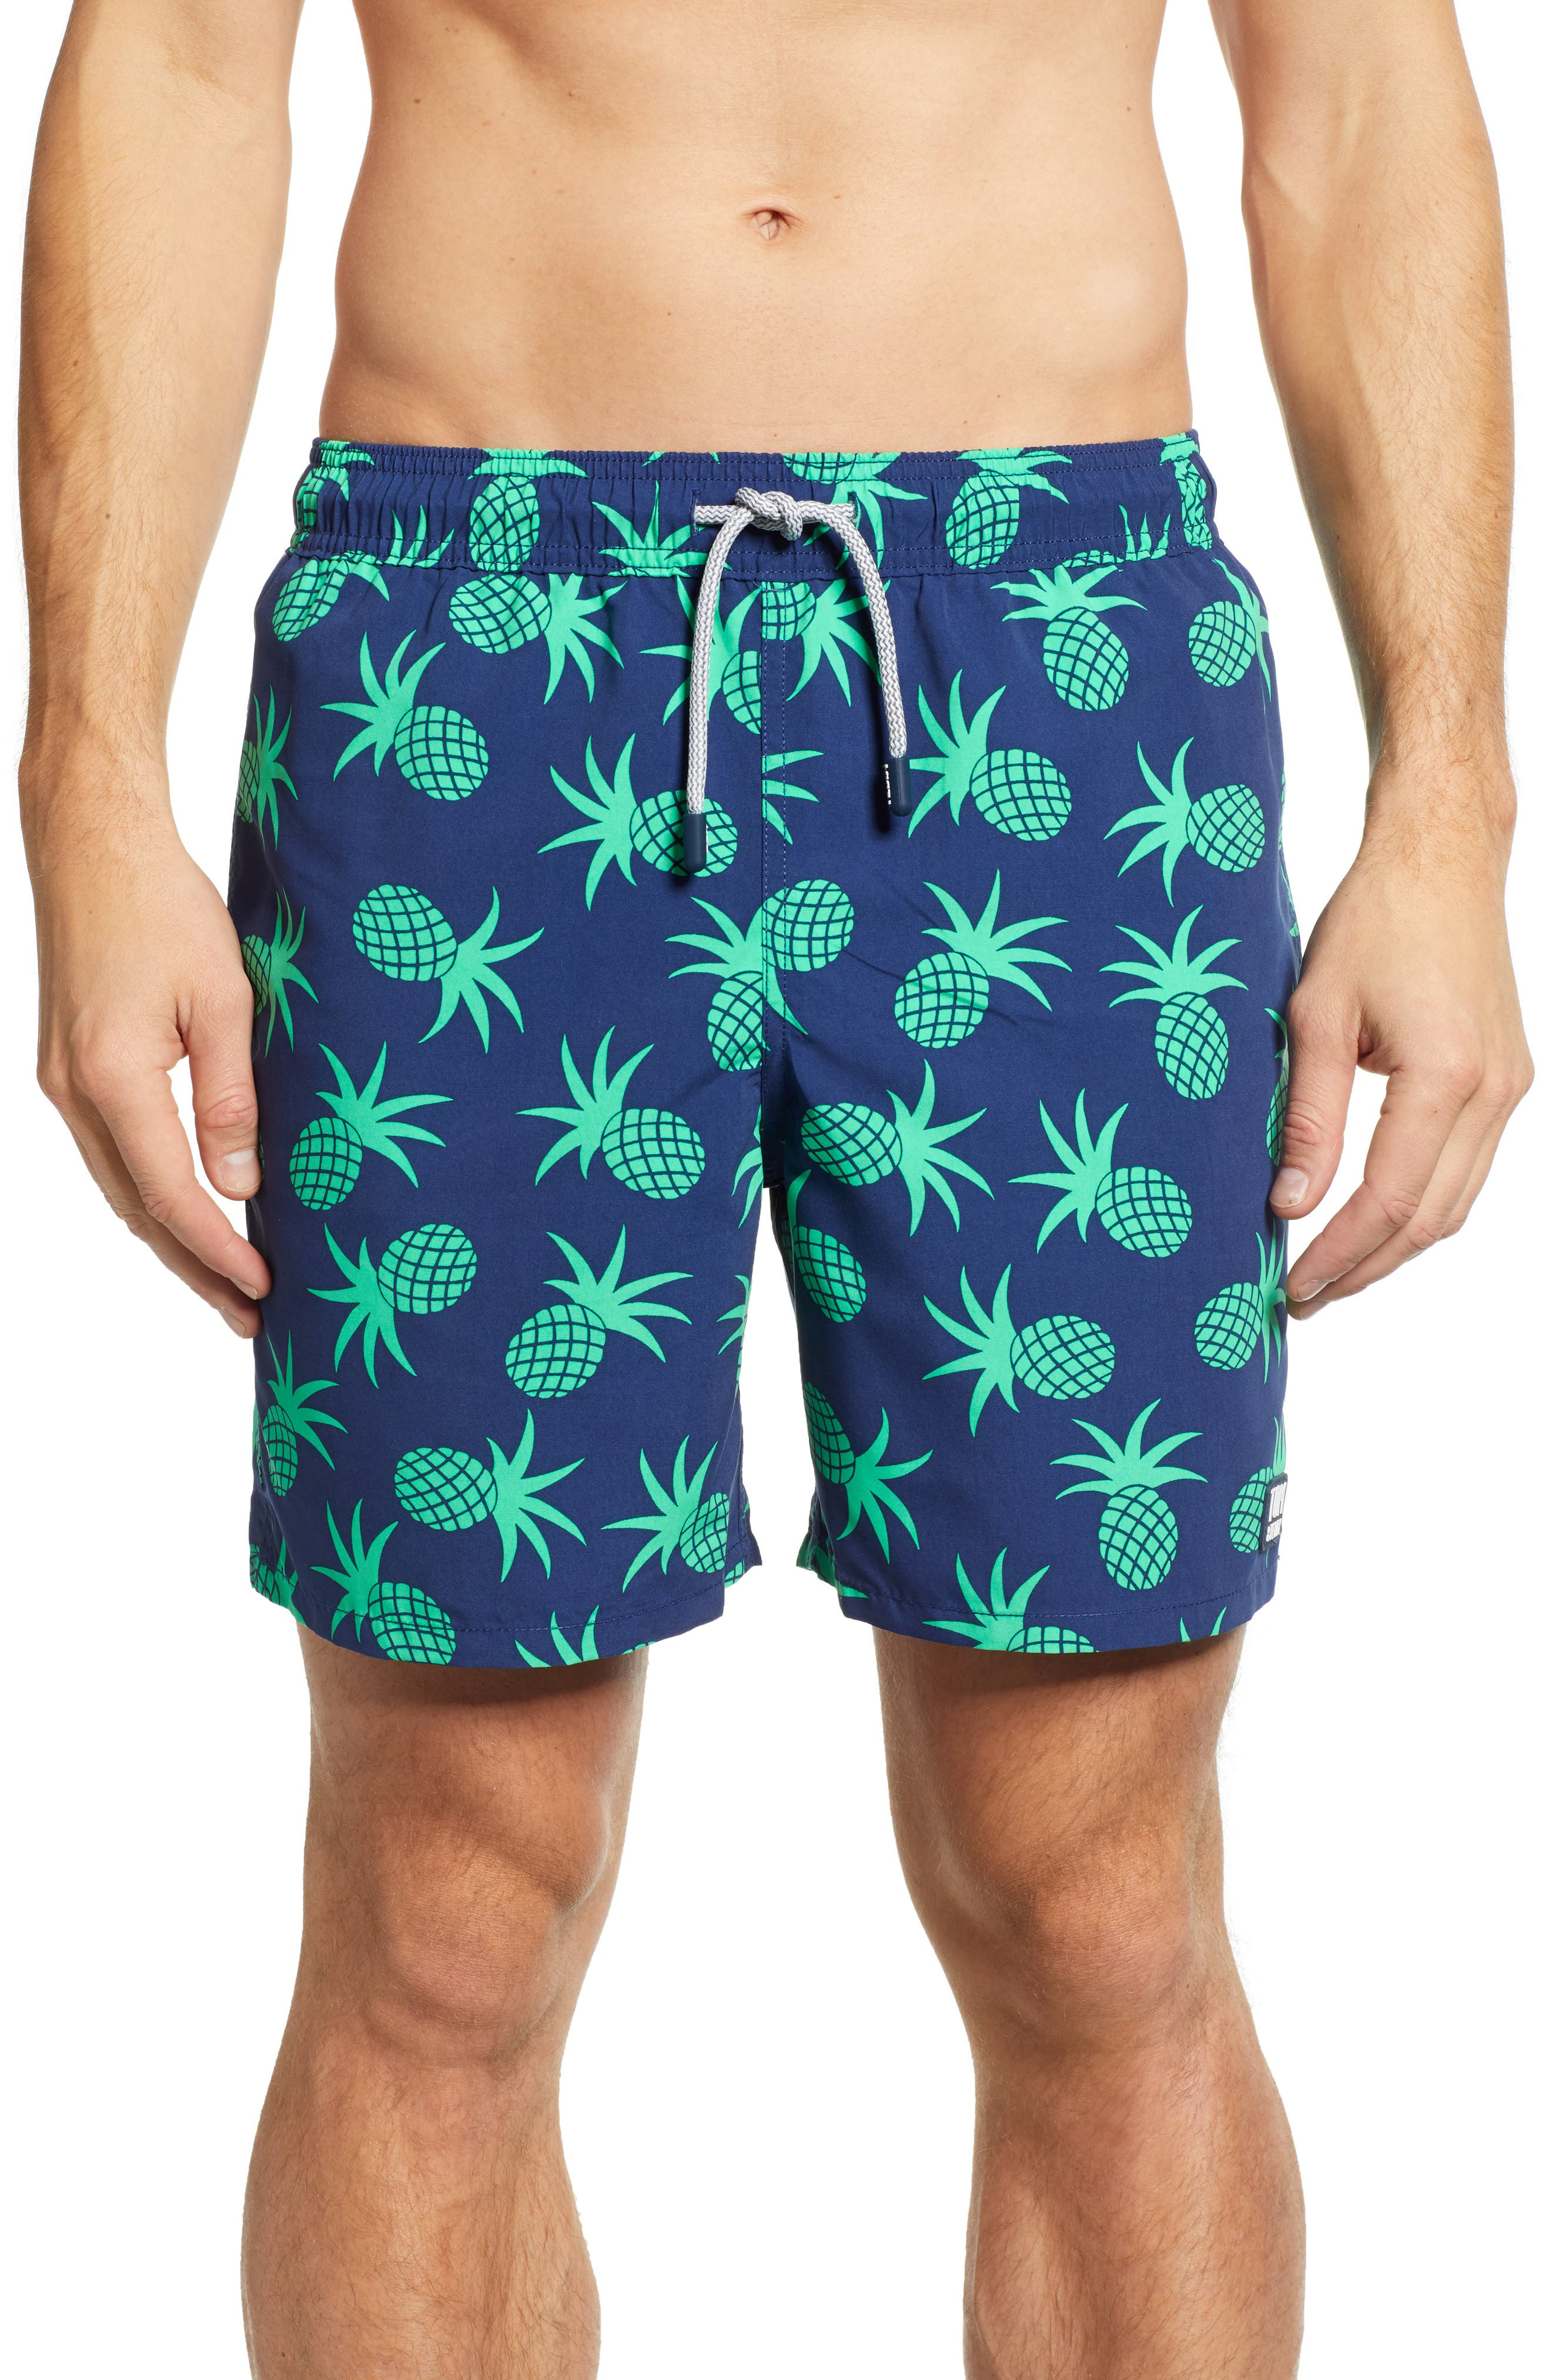 TOM & TEDDY Pineapple Print Swim Trunks in Irish Green